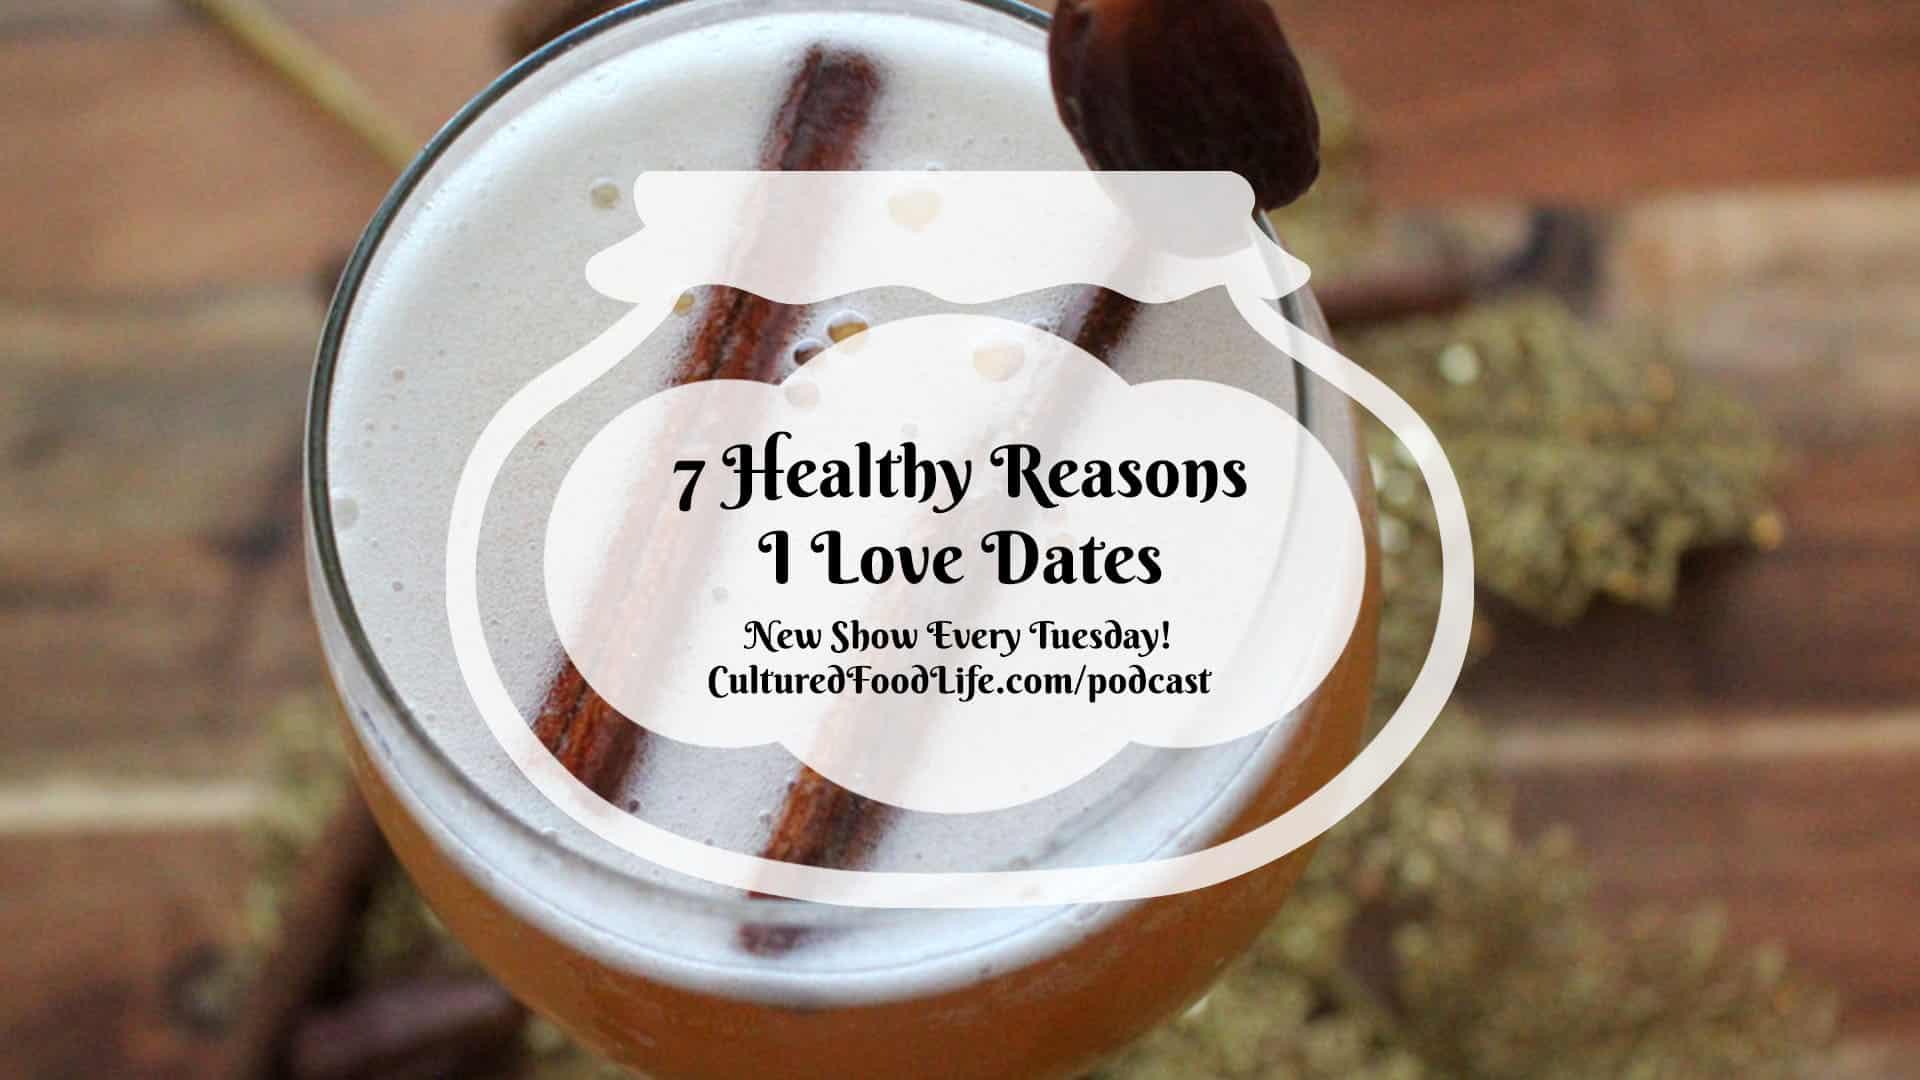 7 Healthy Reasons I Love Dates